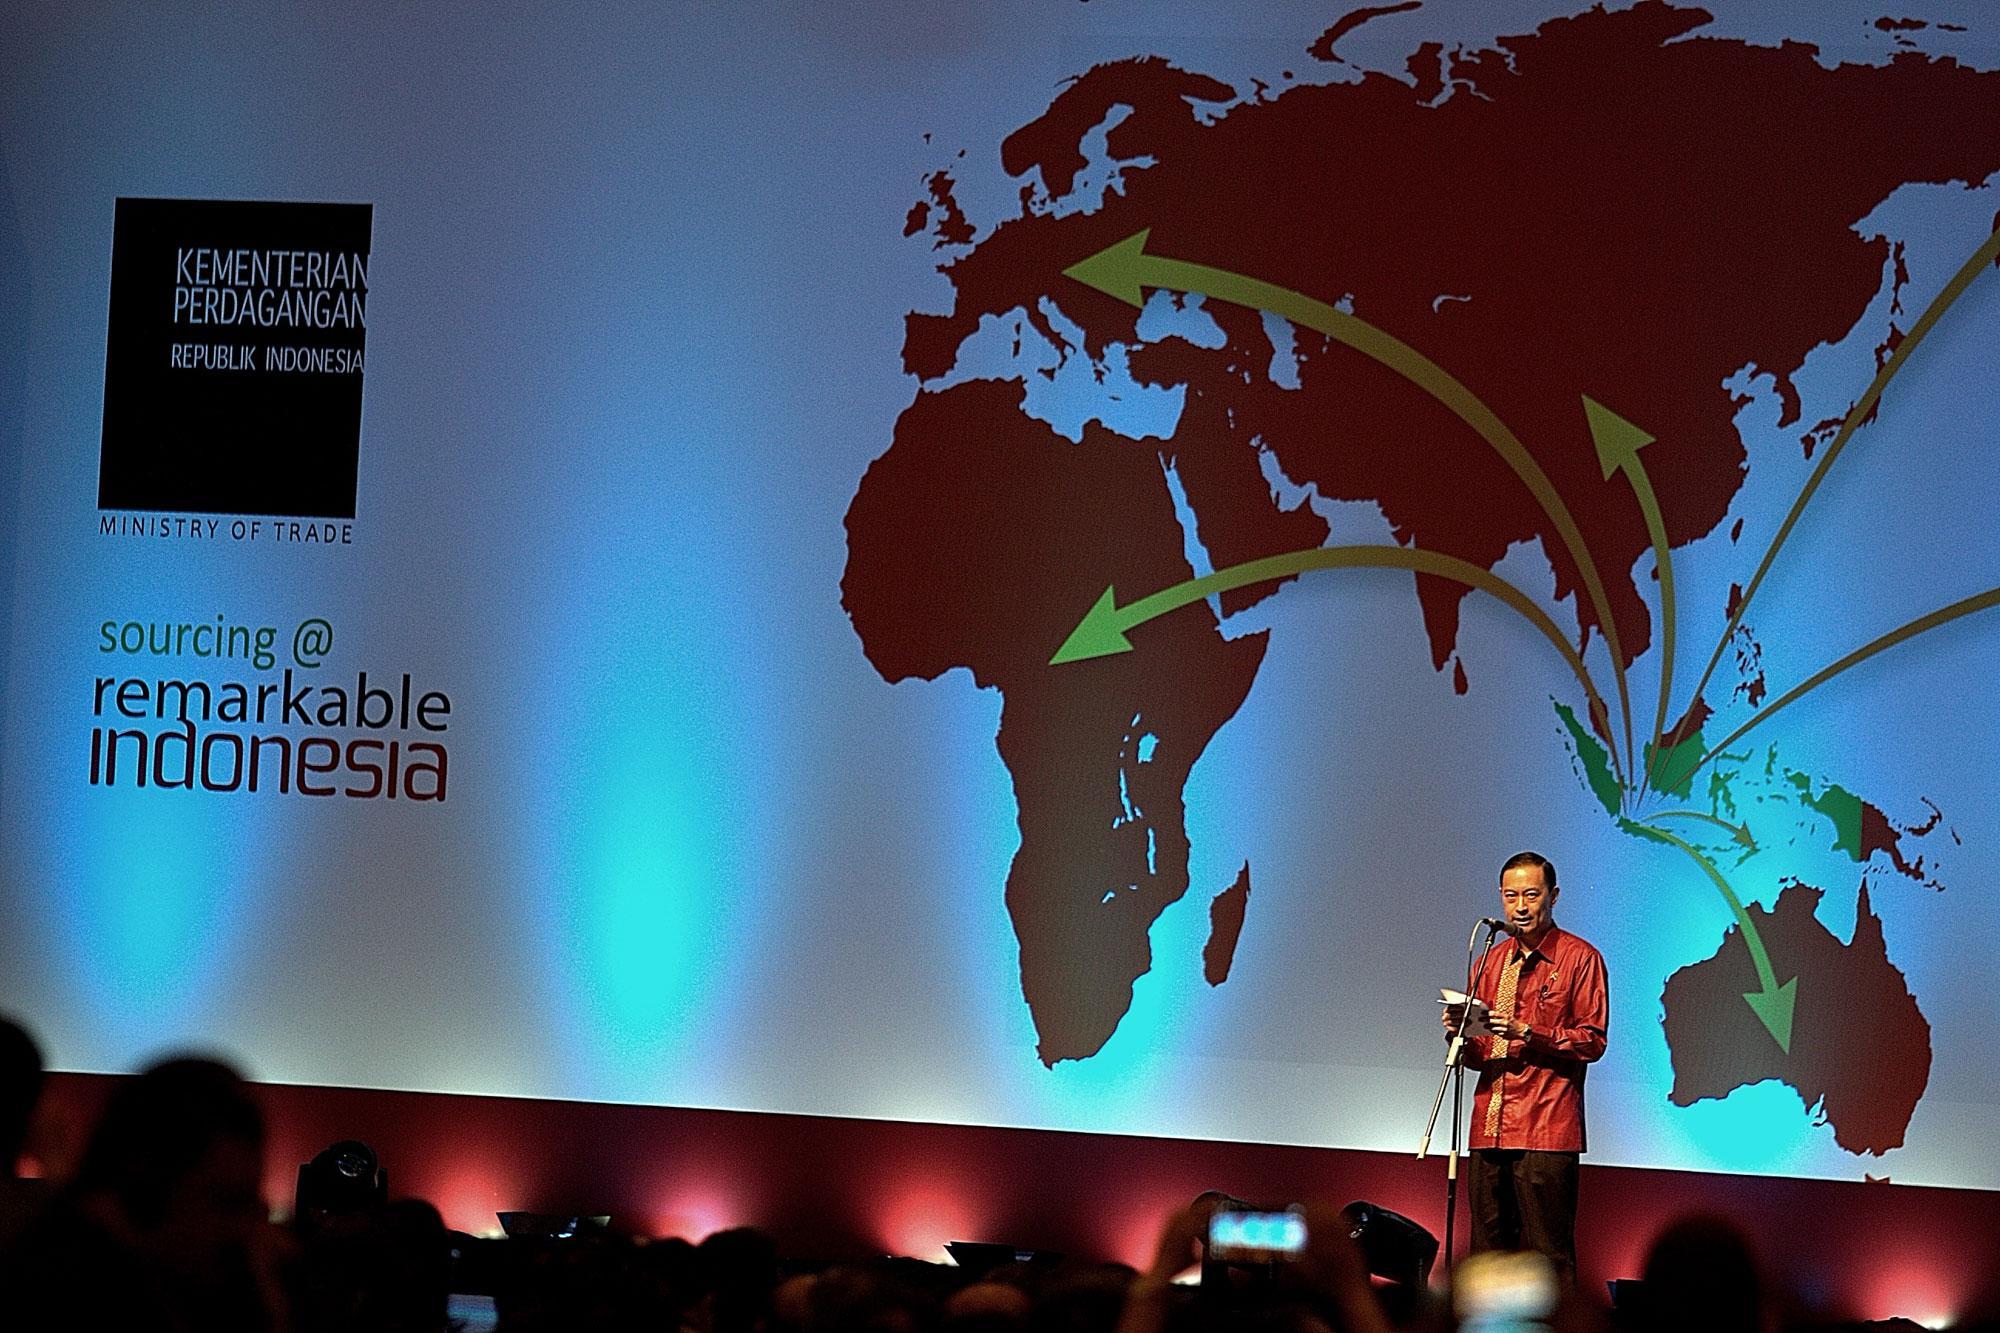 Menteri Perdagangan Thomas Lembong saat pembukaan pameran Trade Expo Indonesia ke-30 Tahun 2015 di Arena Pekan Raya Jakarta, Kemayoran, Jakarta, Rabu (21/10).